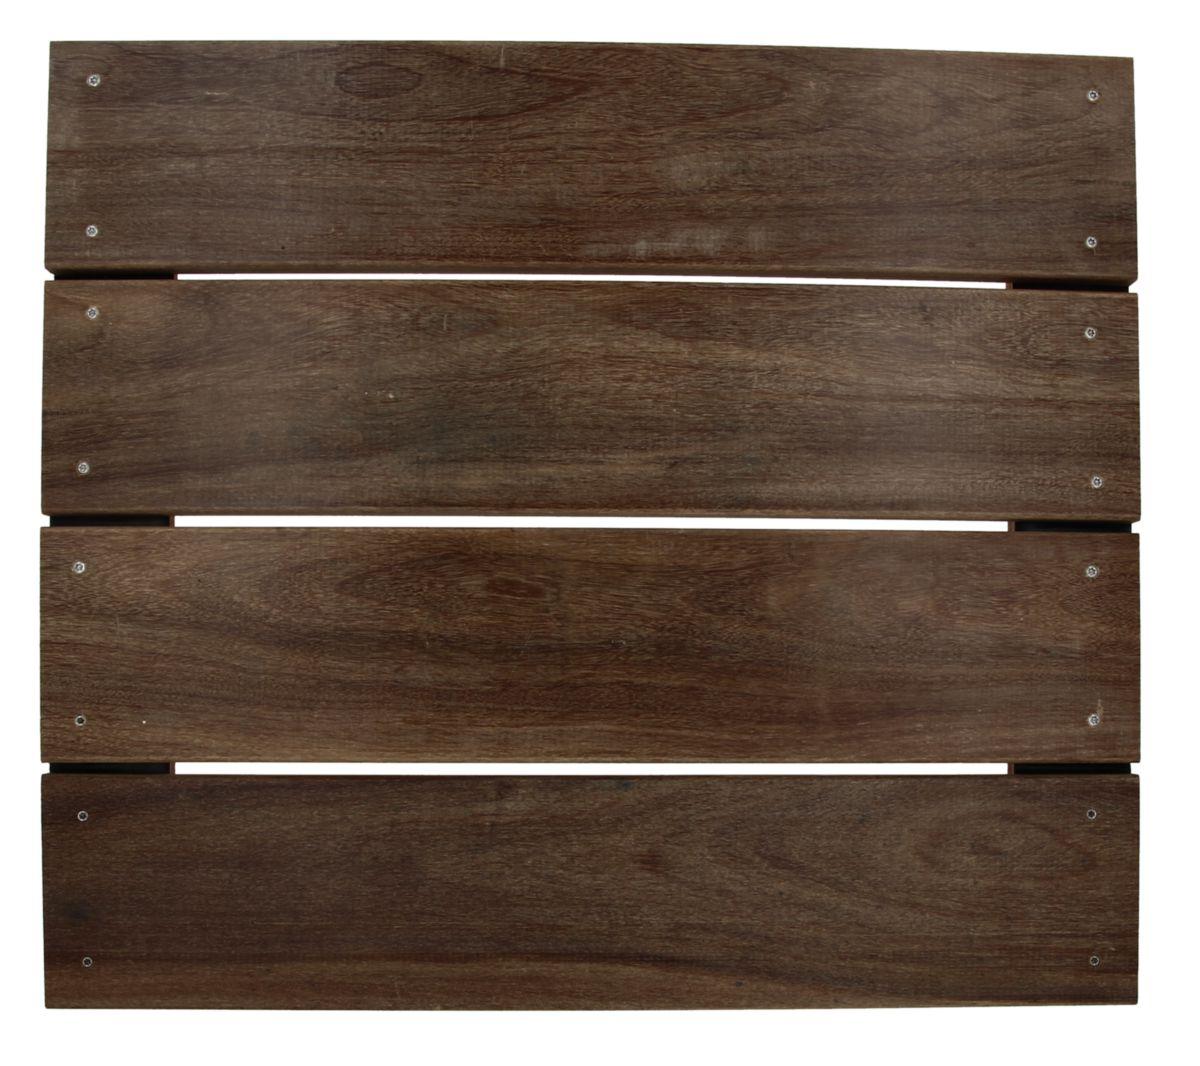 cibm centre import bois lame de terrasse cumaru sec. Black Bedroom Furniture Sets. Home Design Ideas